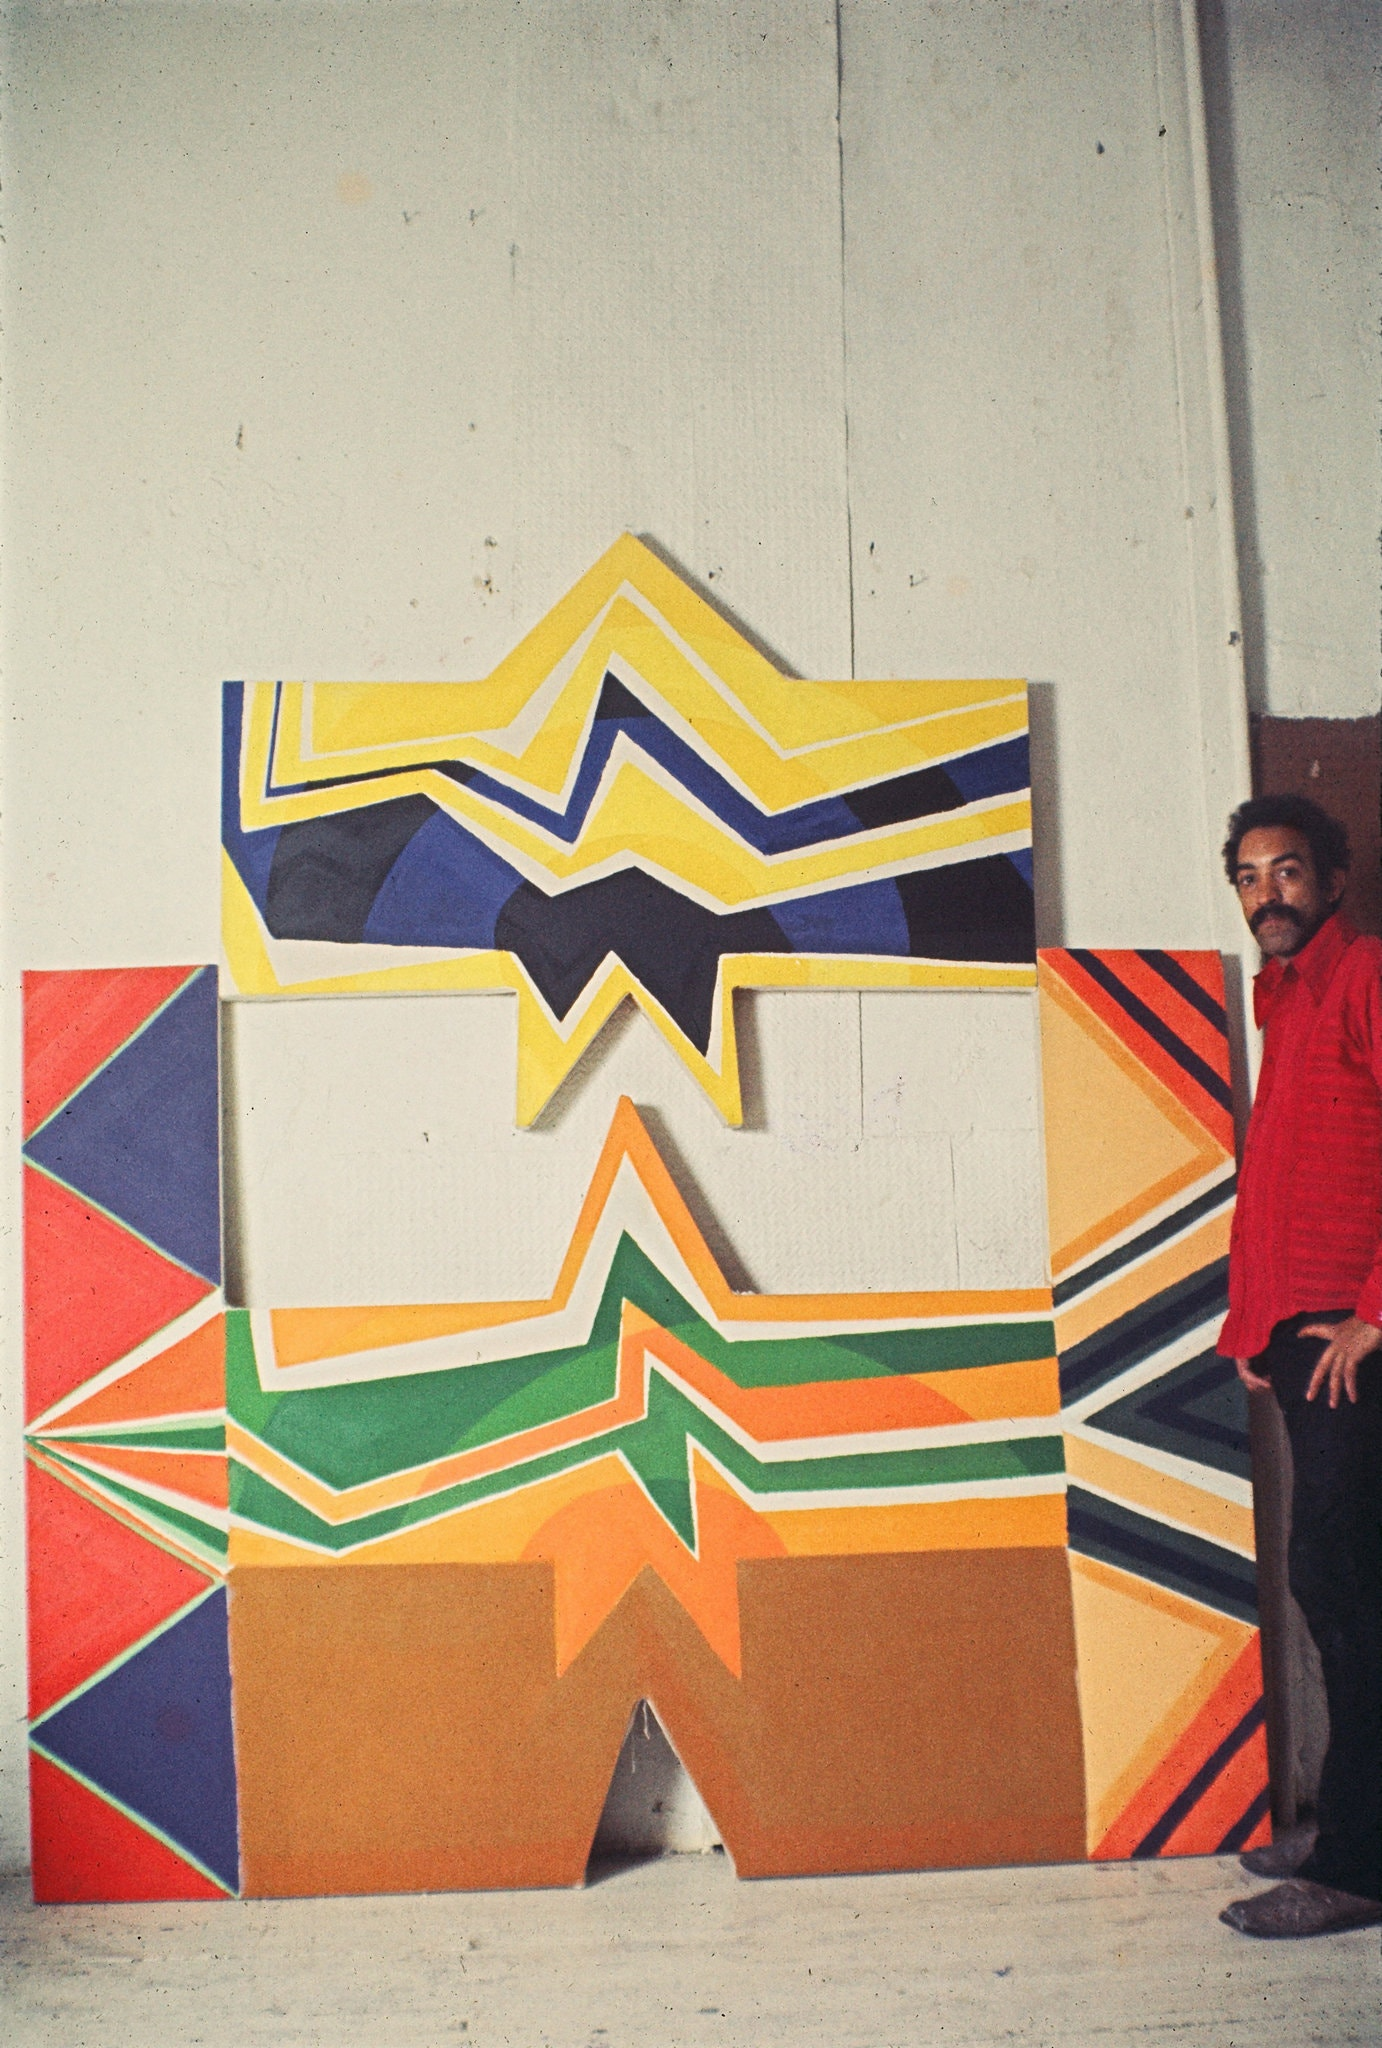 "Joe Overstreet with his painting ""North Star"" (1968). Joe Overstreet/Artists Rights Society (ARS), New York, via Eric Firestone Gallery, New York. - The New York Times"